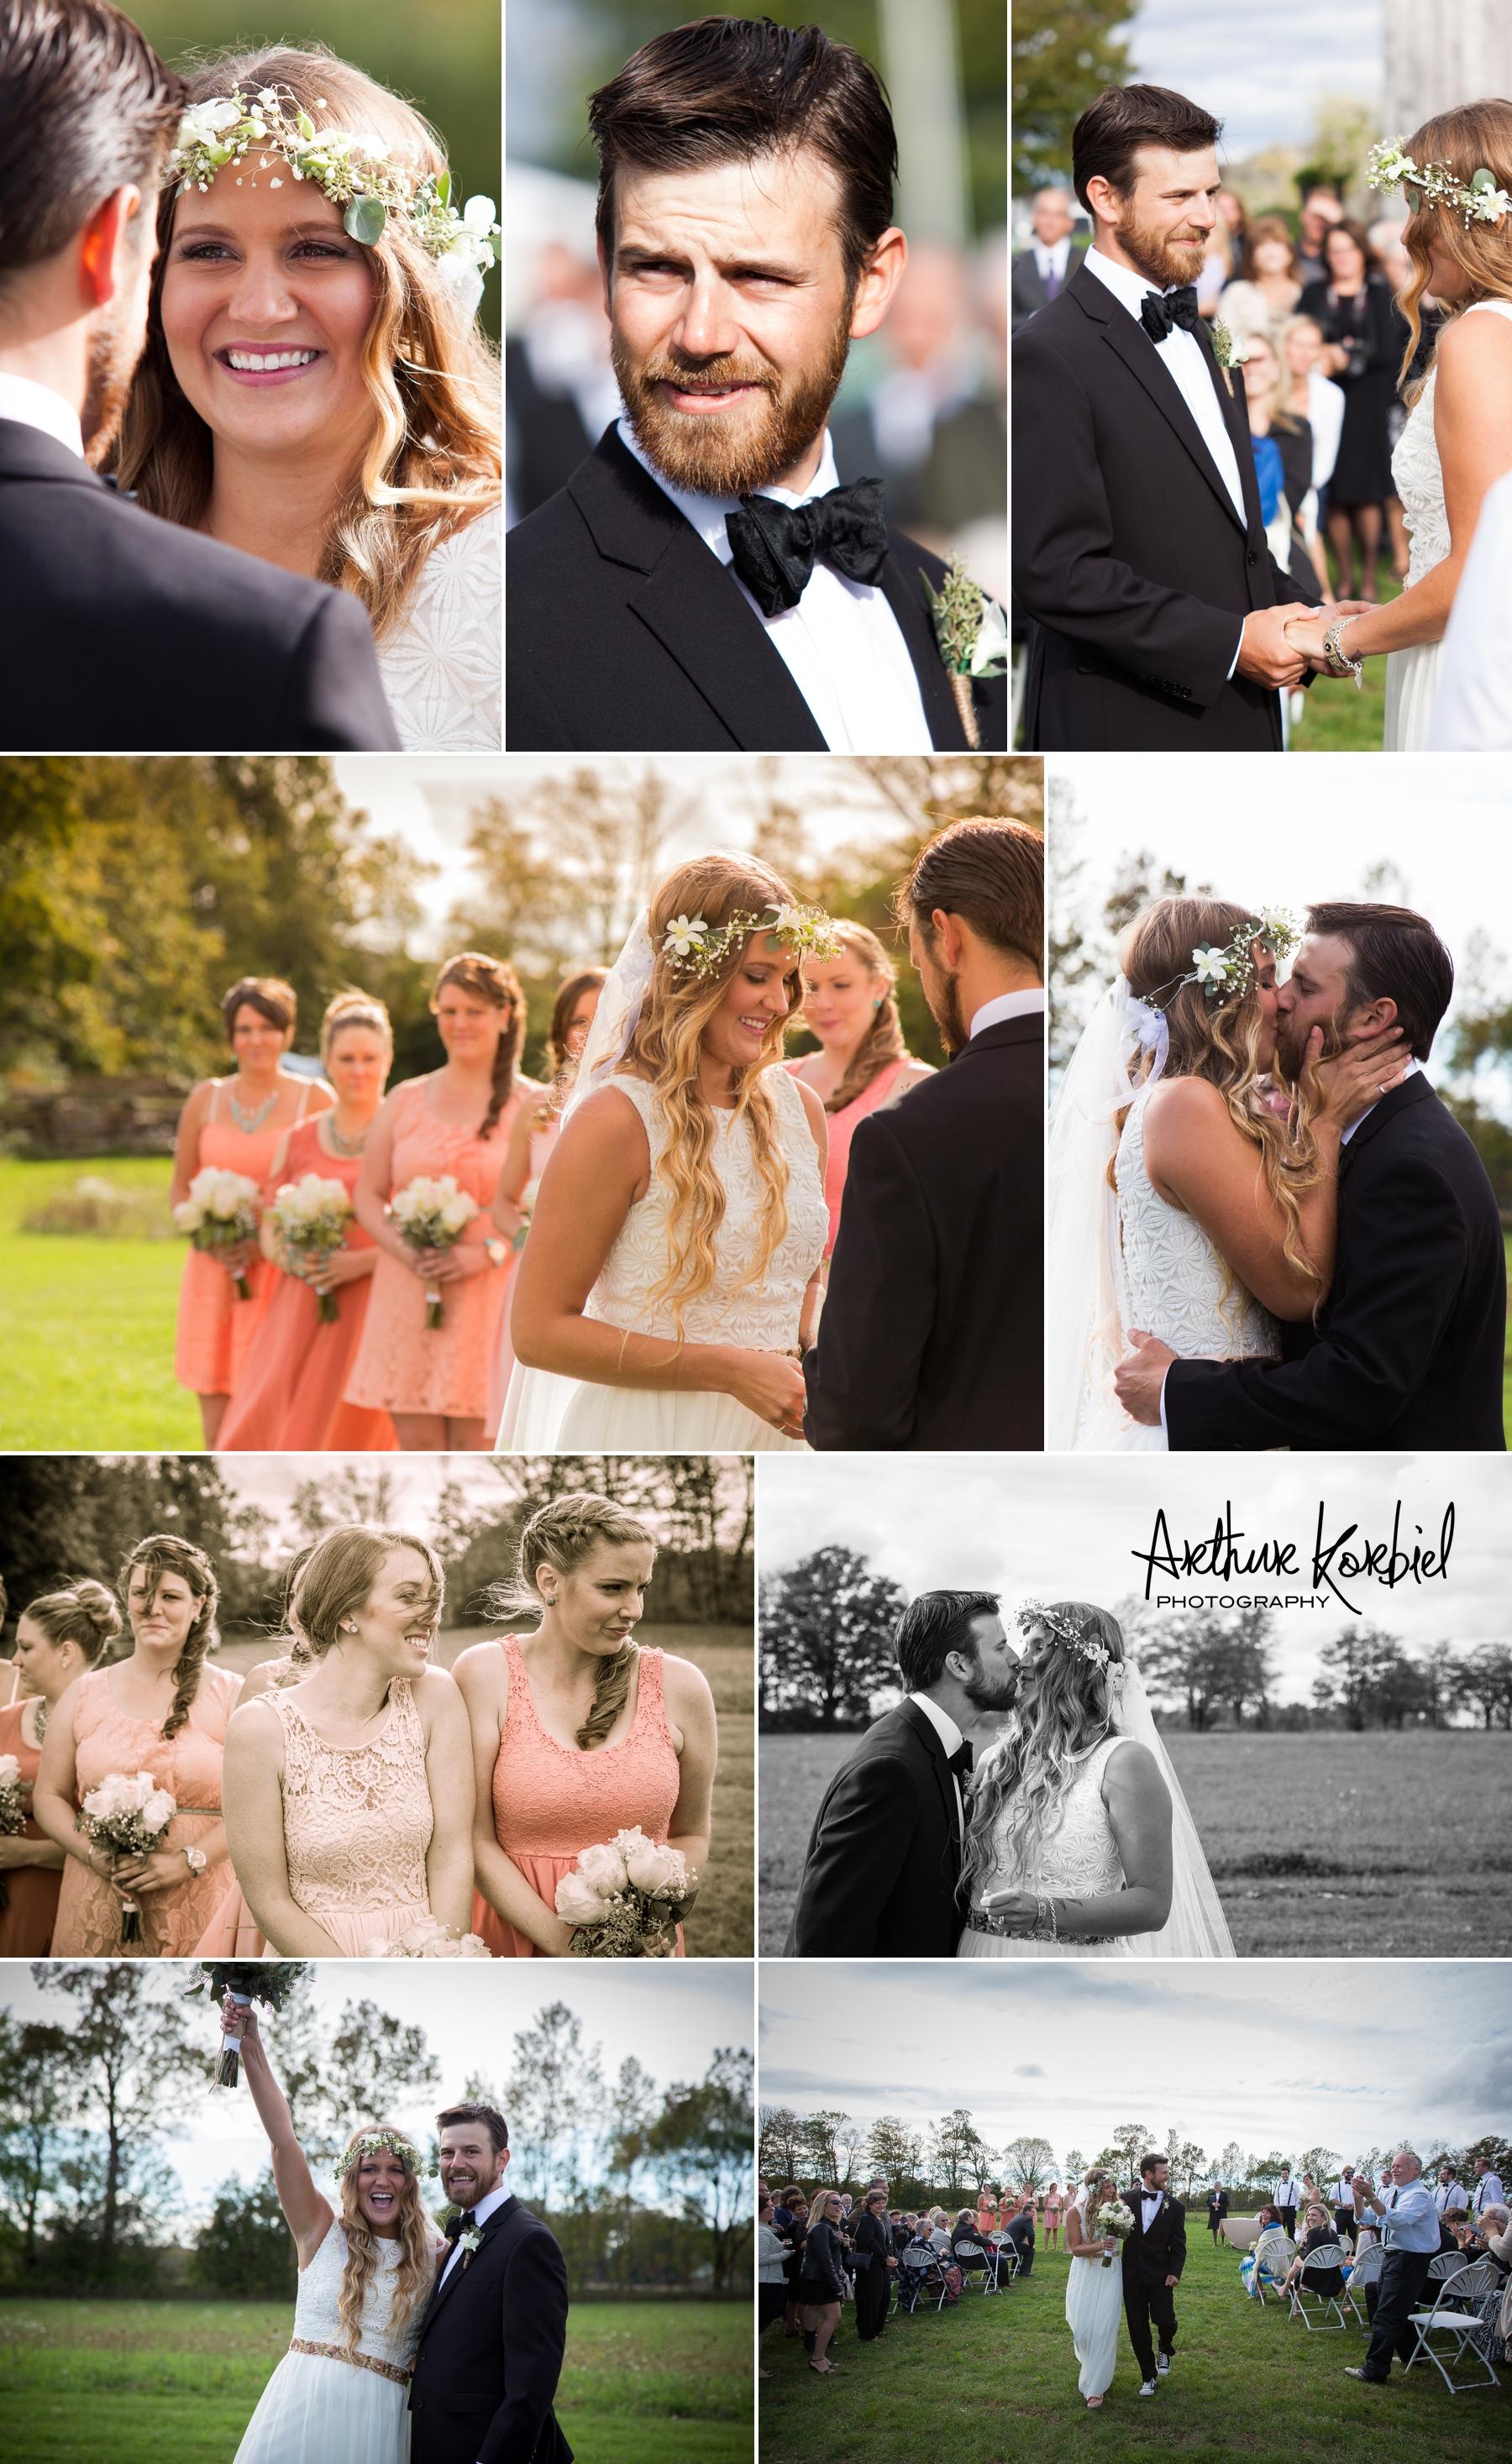 Arthur Korbiel Photography - London Engagement Photographer - Sauble Beach Barn Wedding - Samantha & Dan_006.jpg